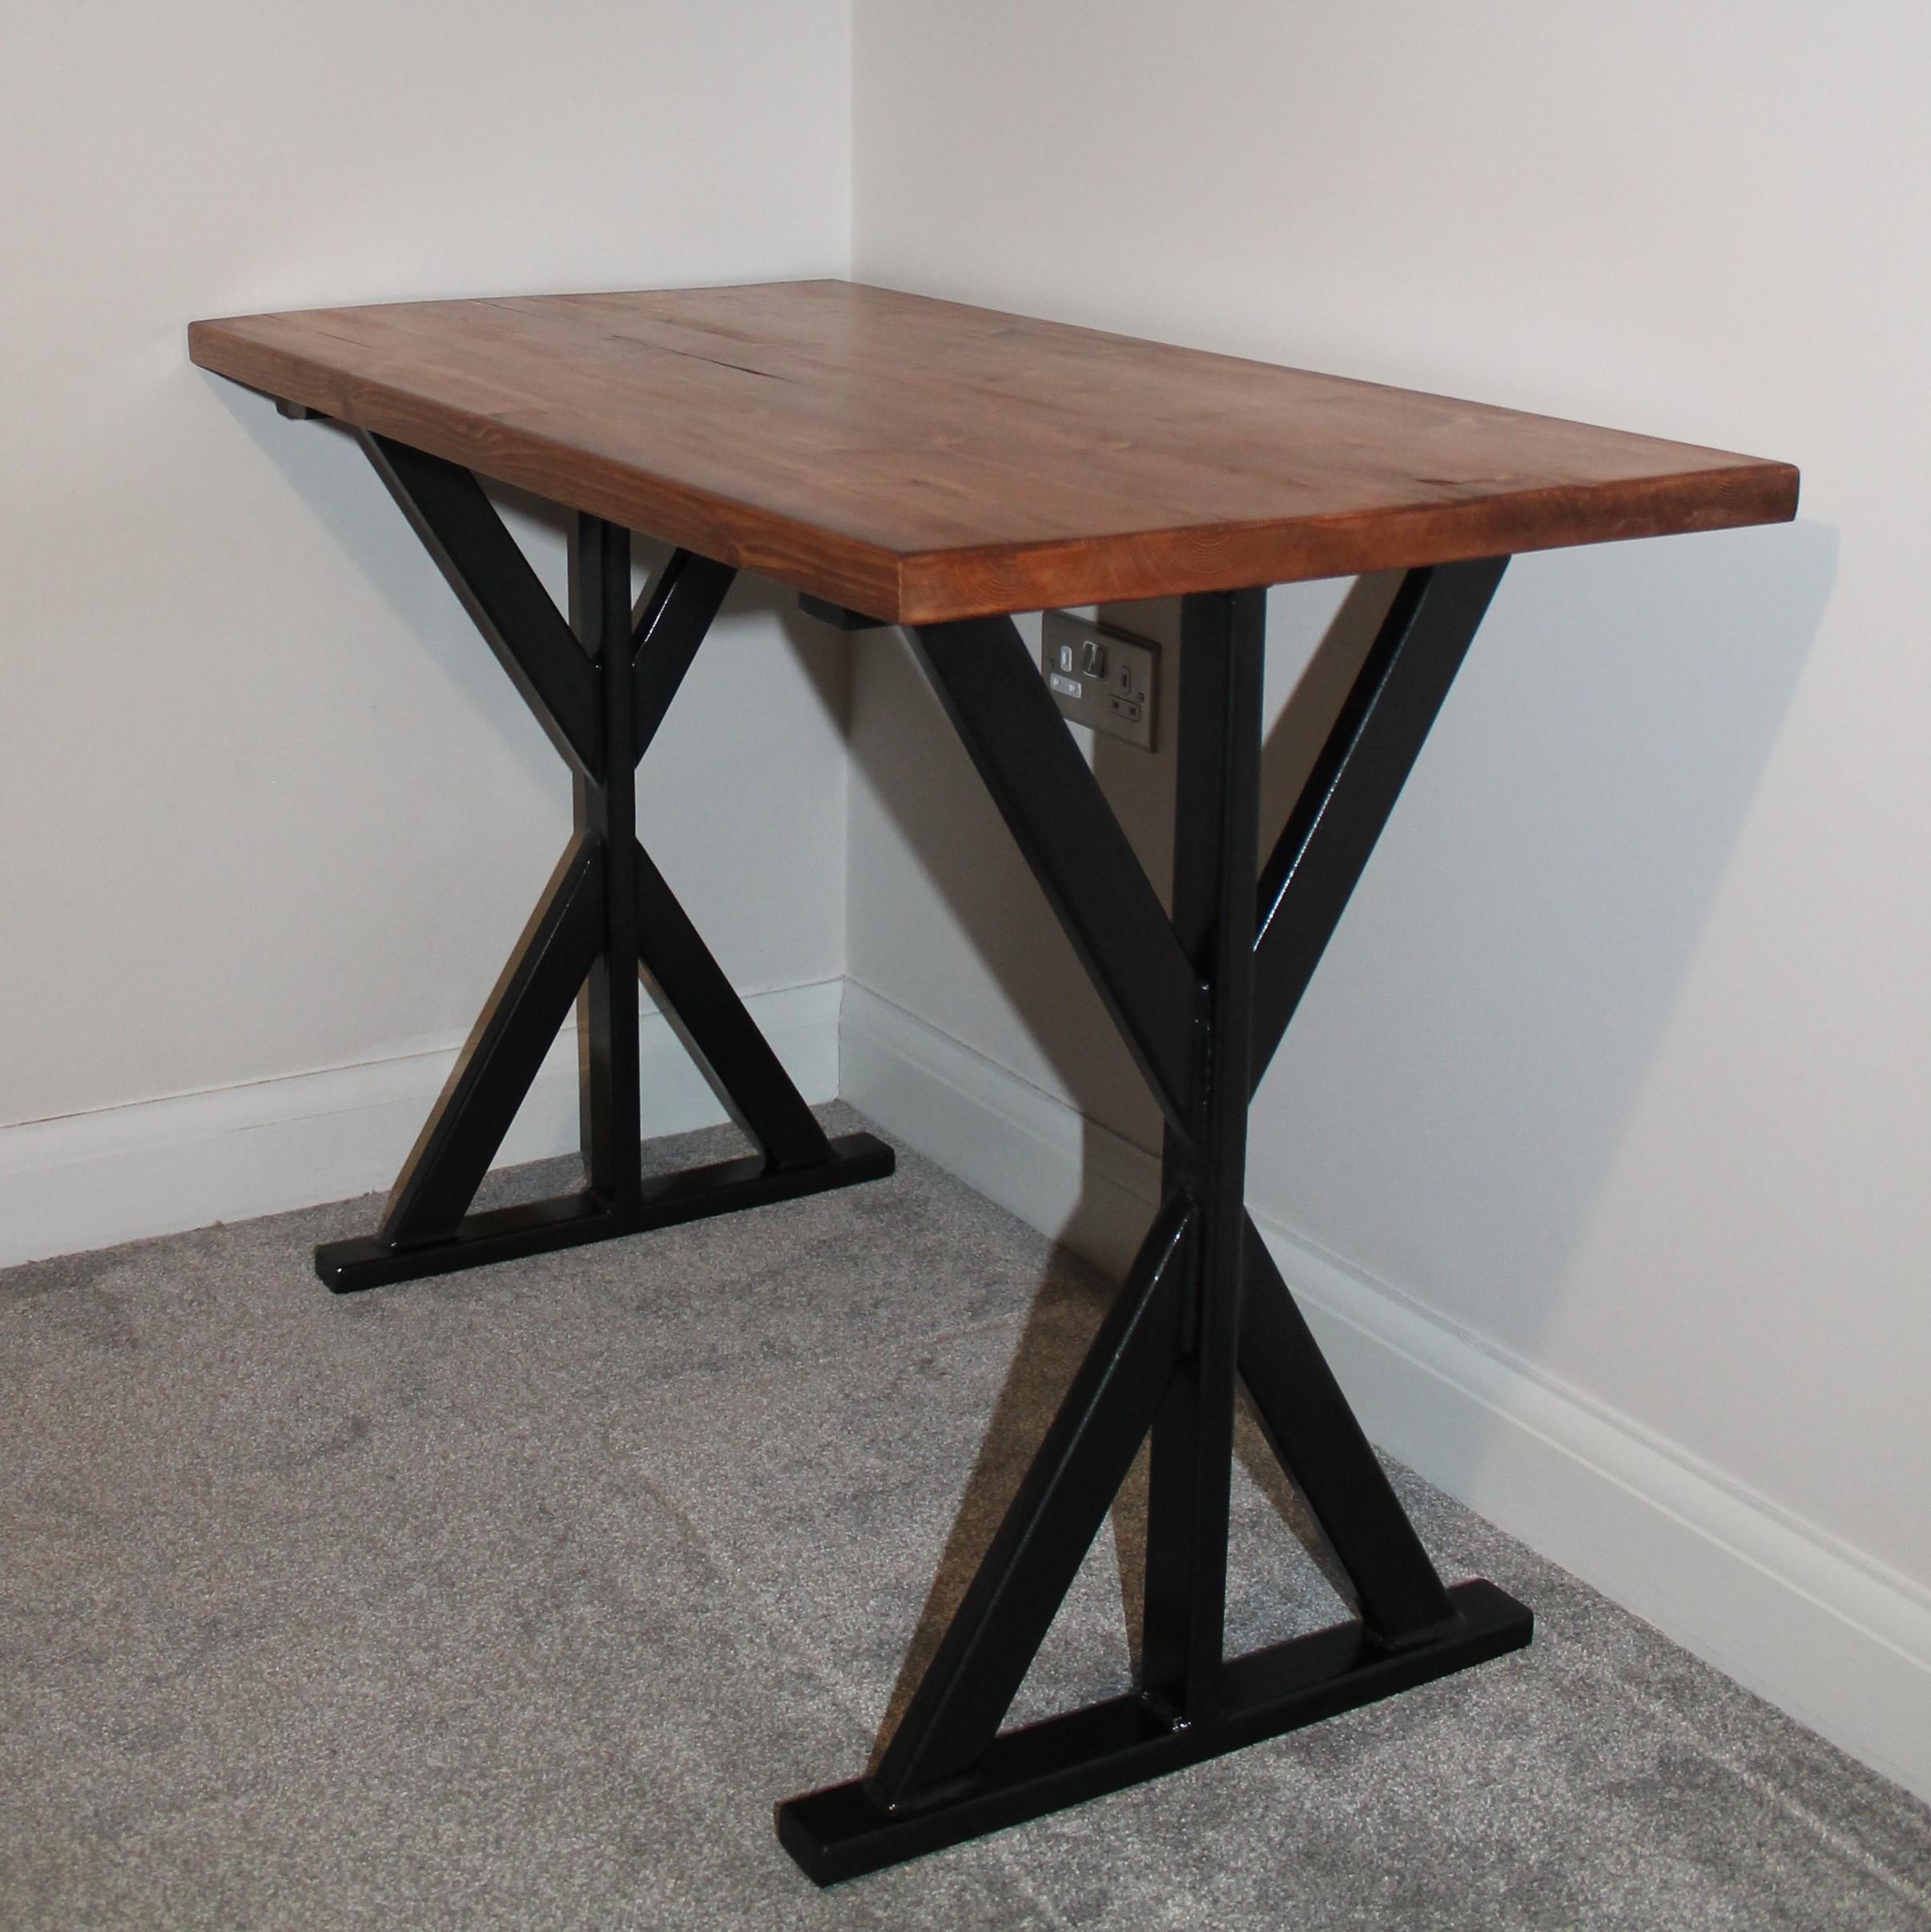 Reclaimed Wood Office Desk With Handmade Metal Legs